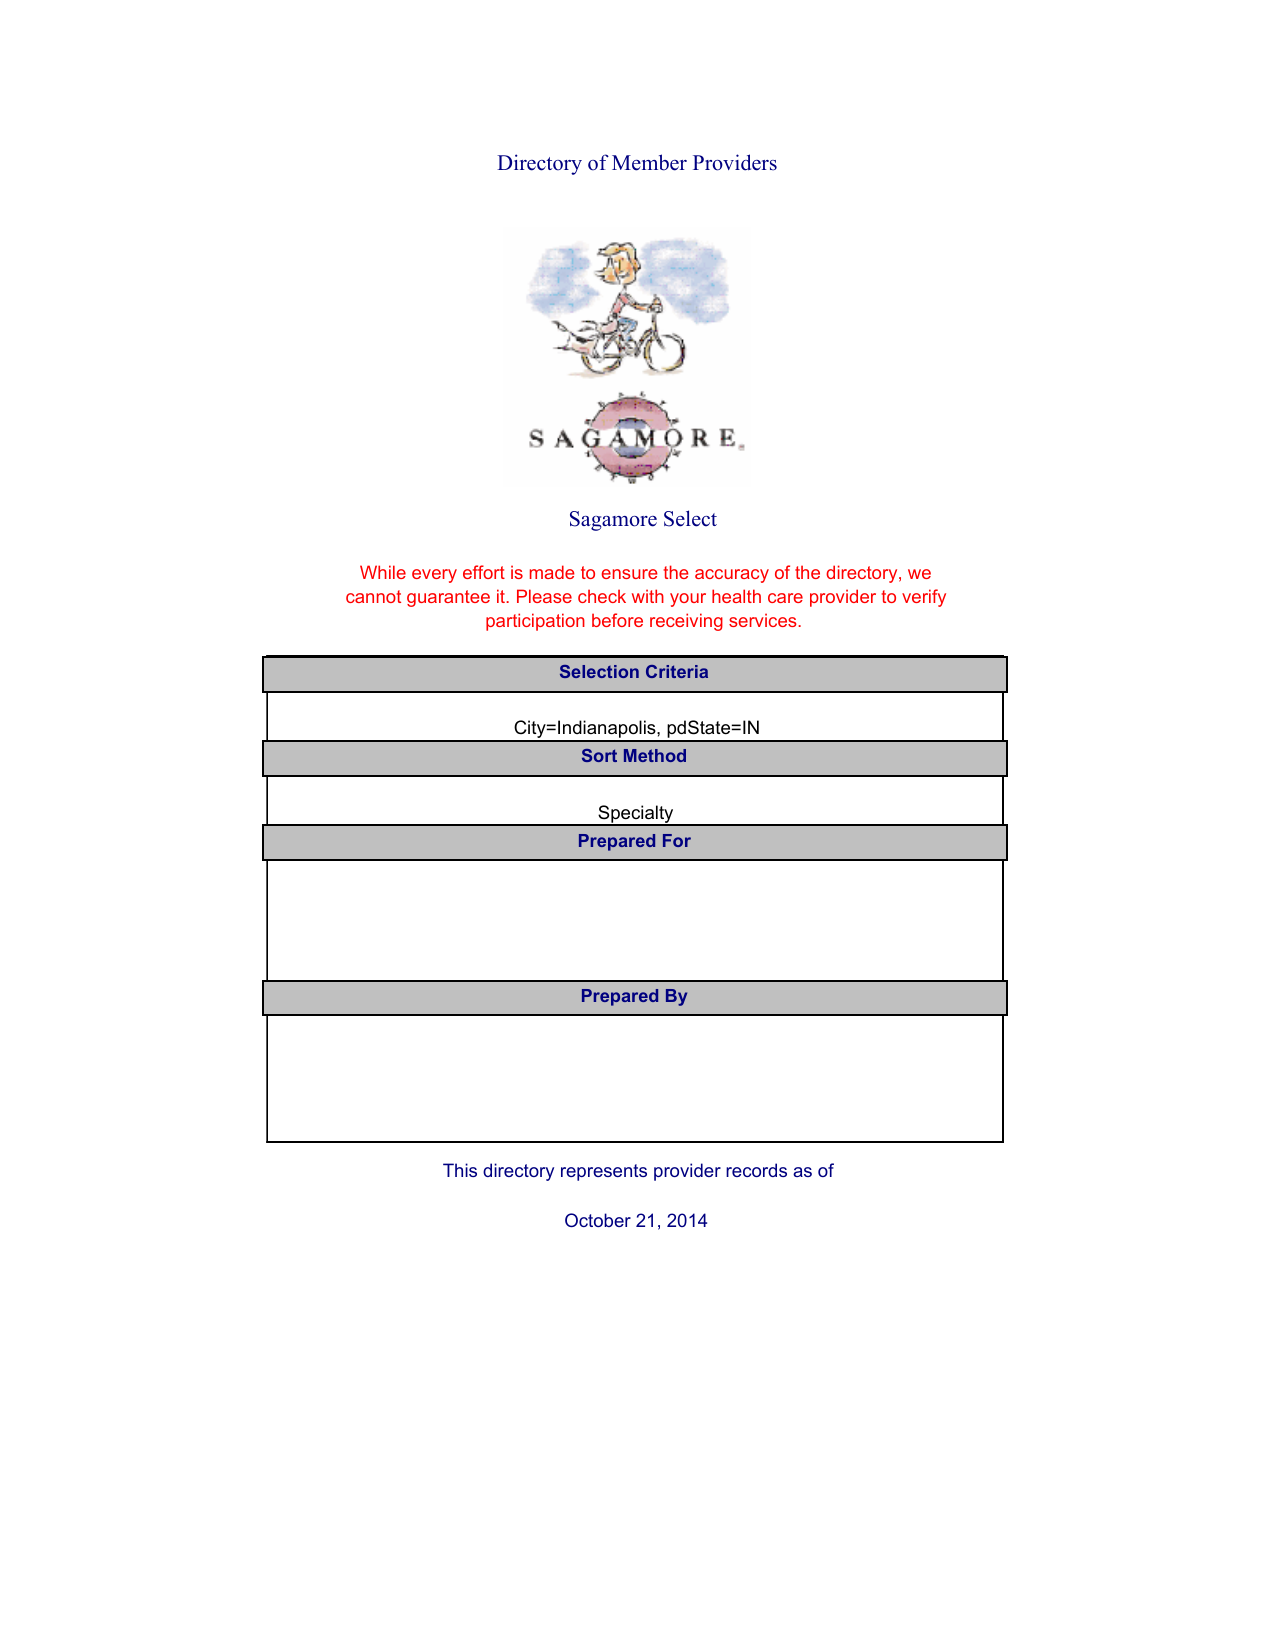 Sagamore Select Directory of Member Providers - Sagamore Health